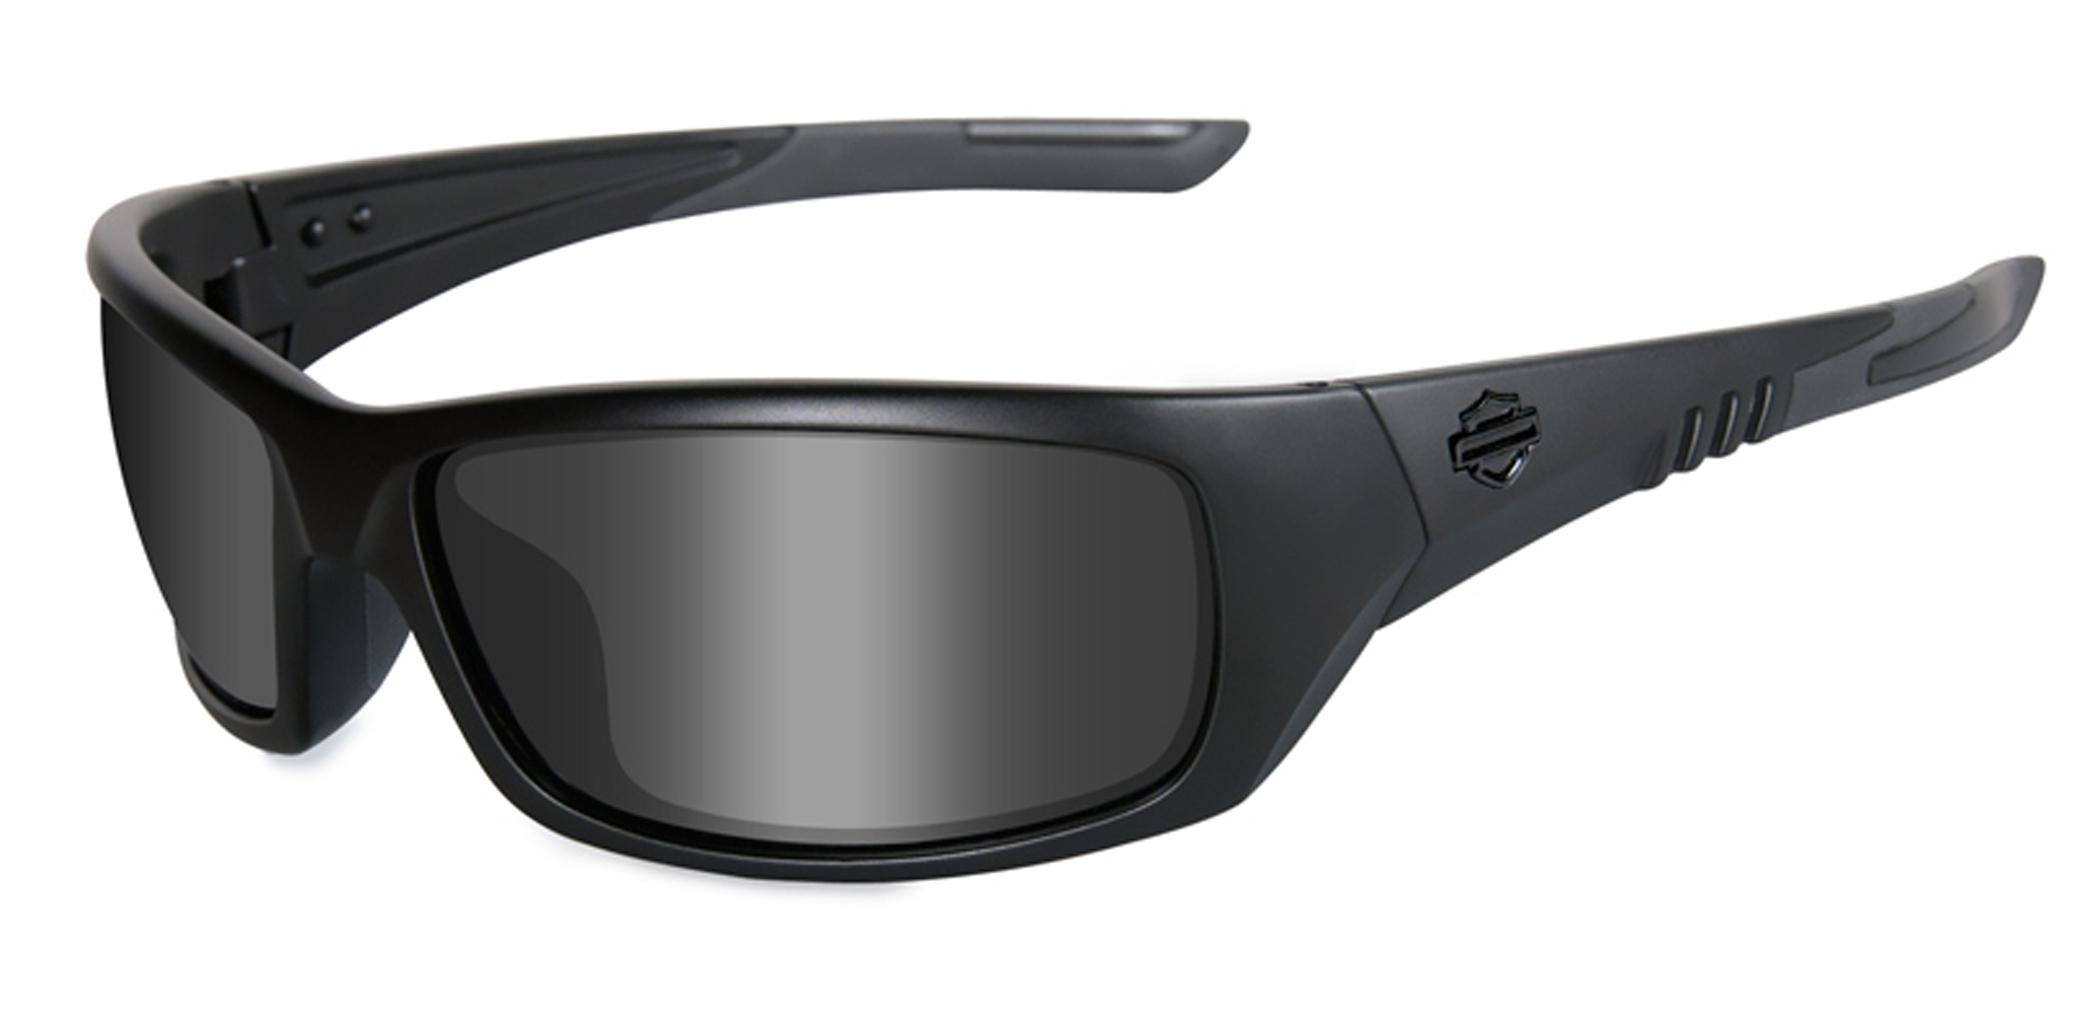 hd 174 grit joins harley davidson 174 performance eyewear line